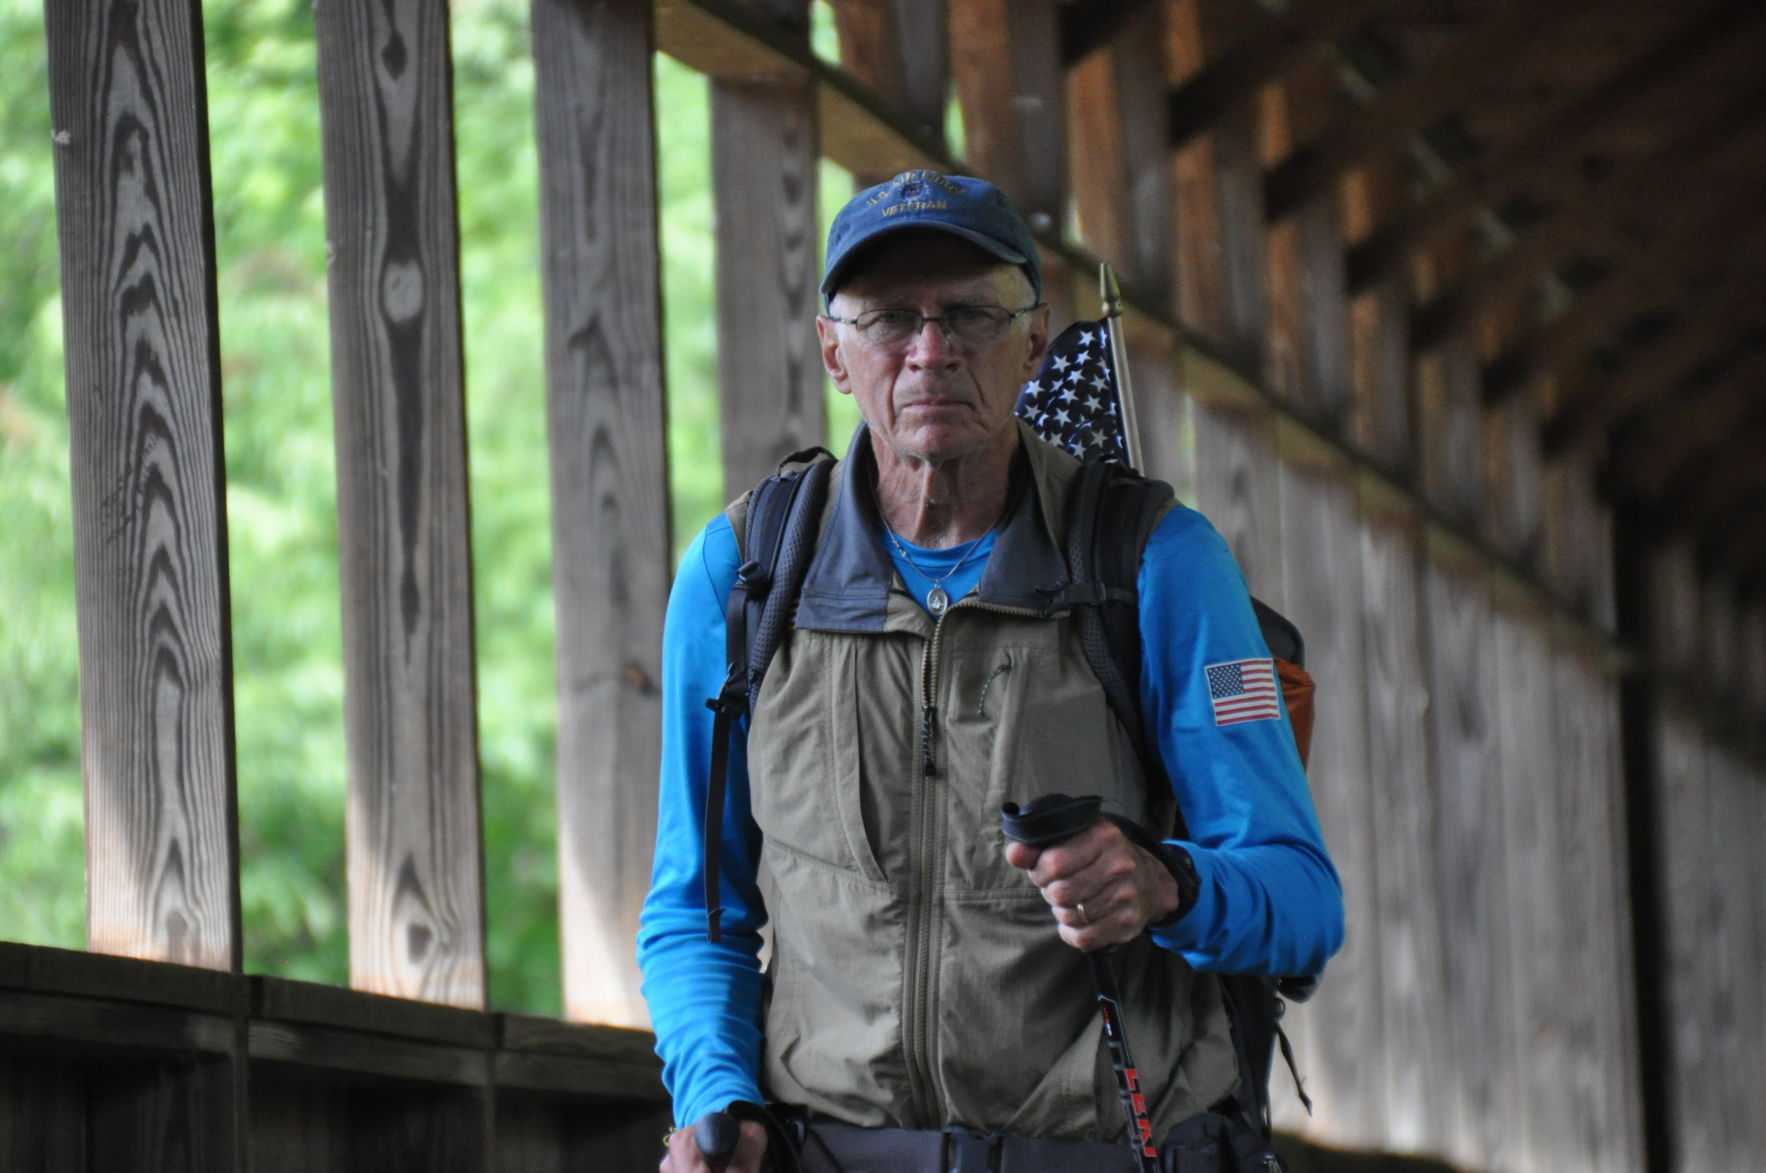 Veteran hiking across America passes through Knox County